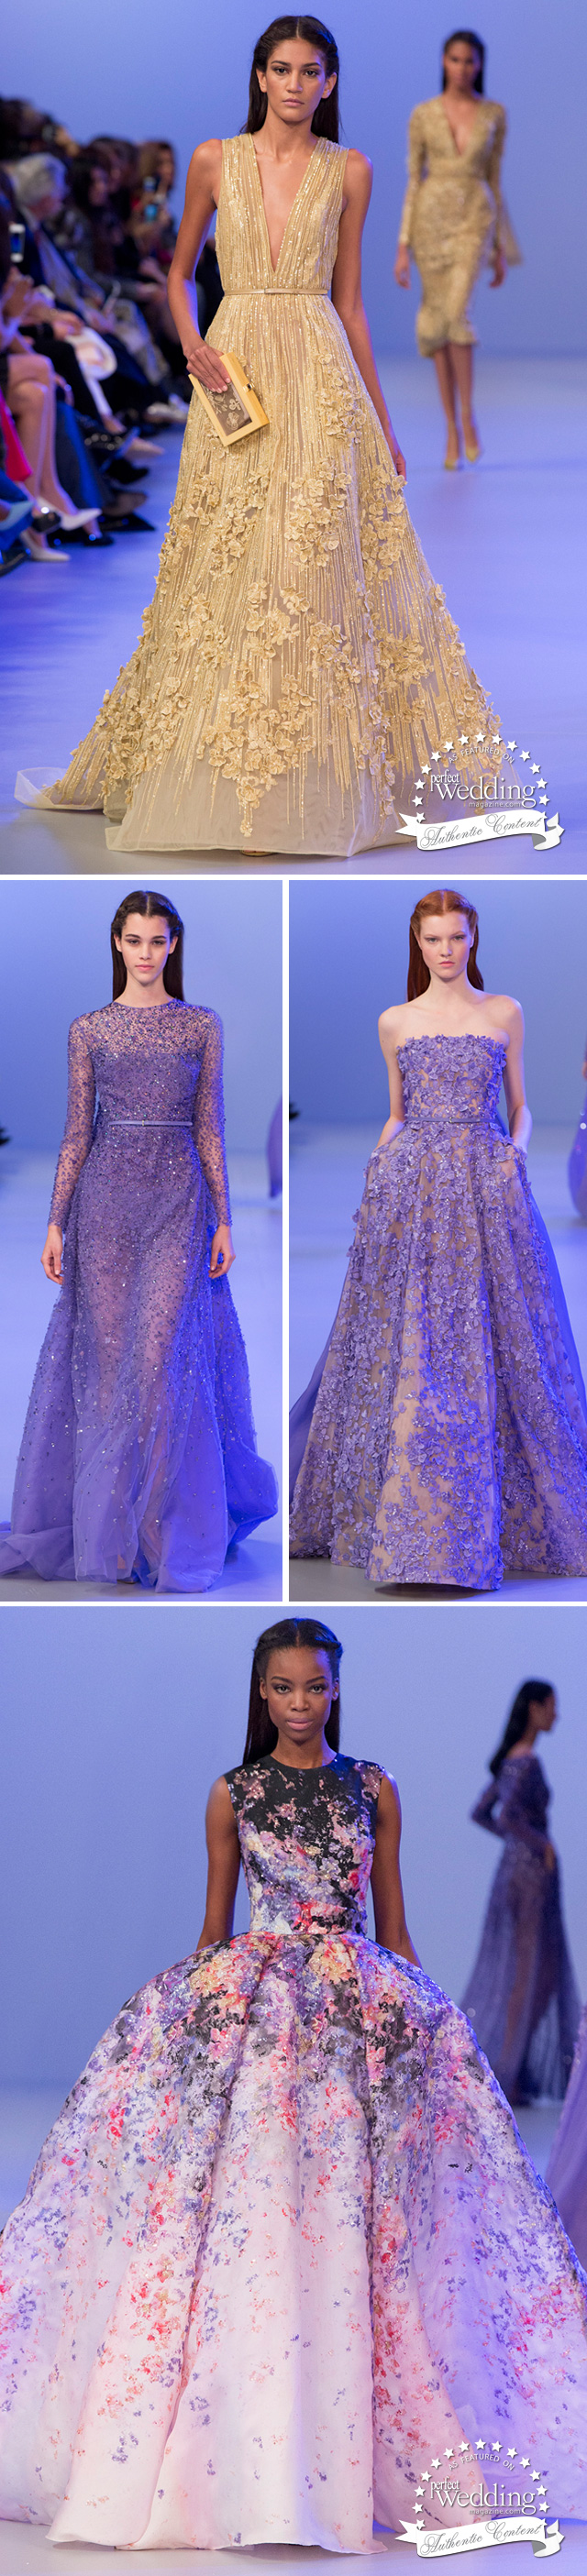 Elie Saab Spring Summer 2014 Haute Couture, Perfect Wedding magazine, Wedding gowns